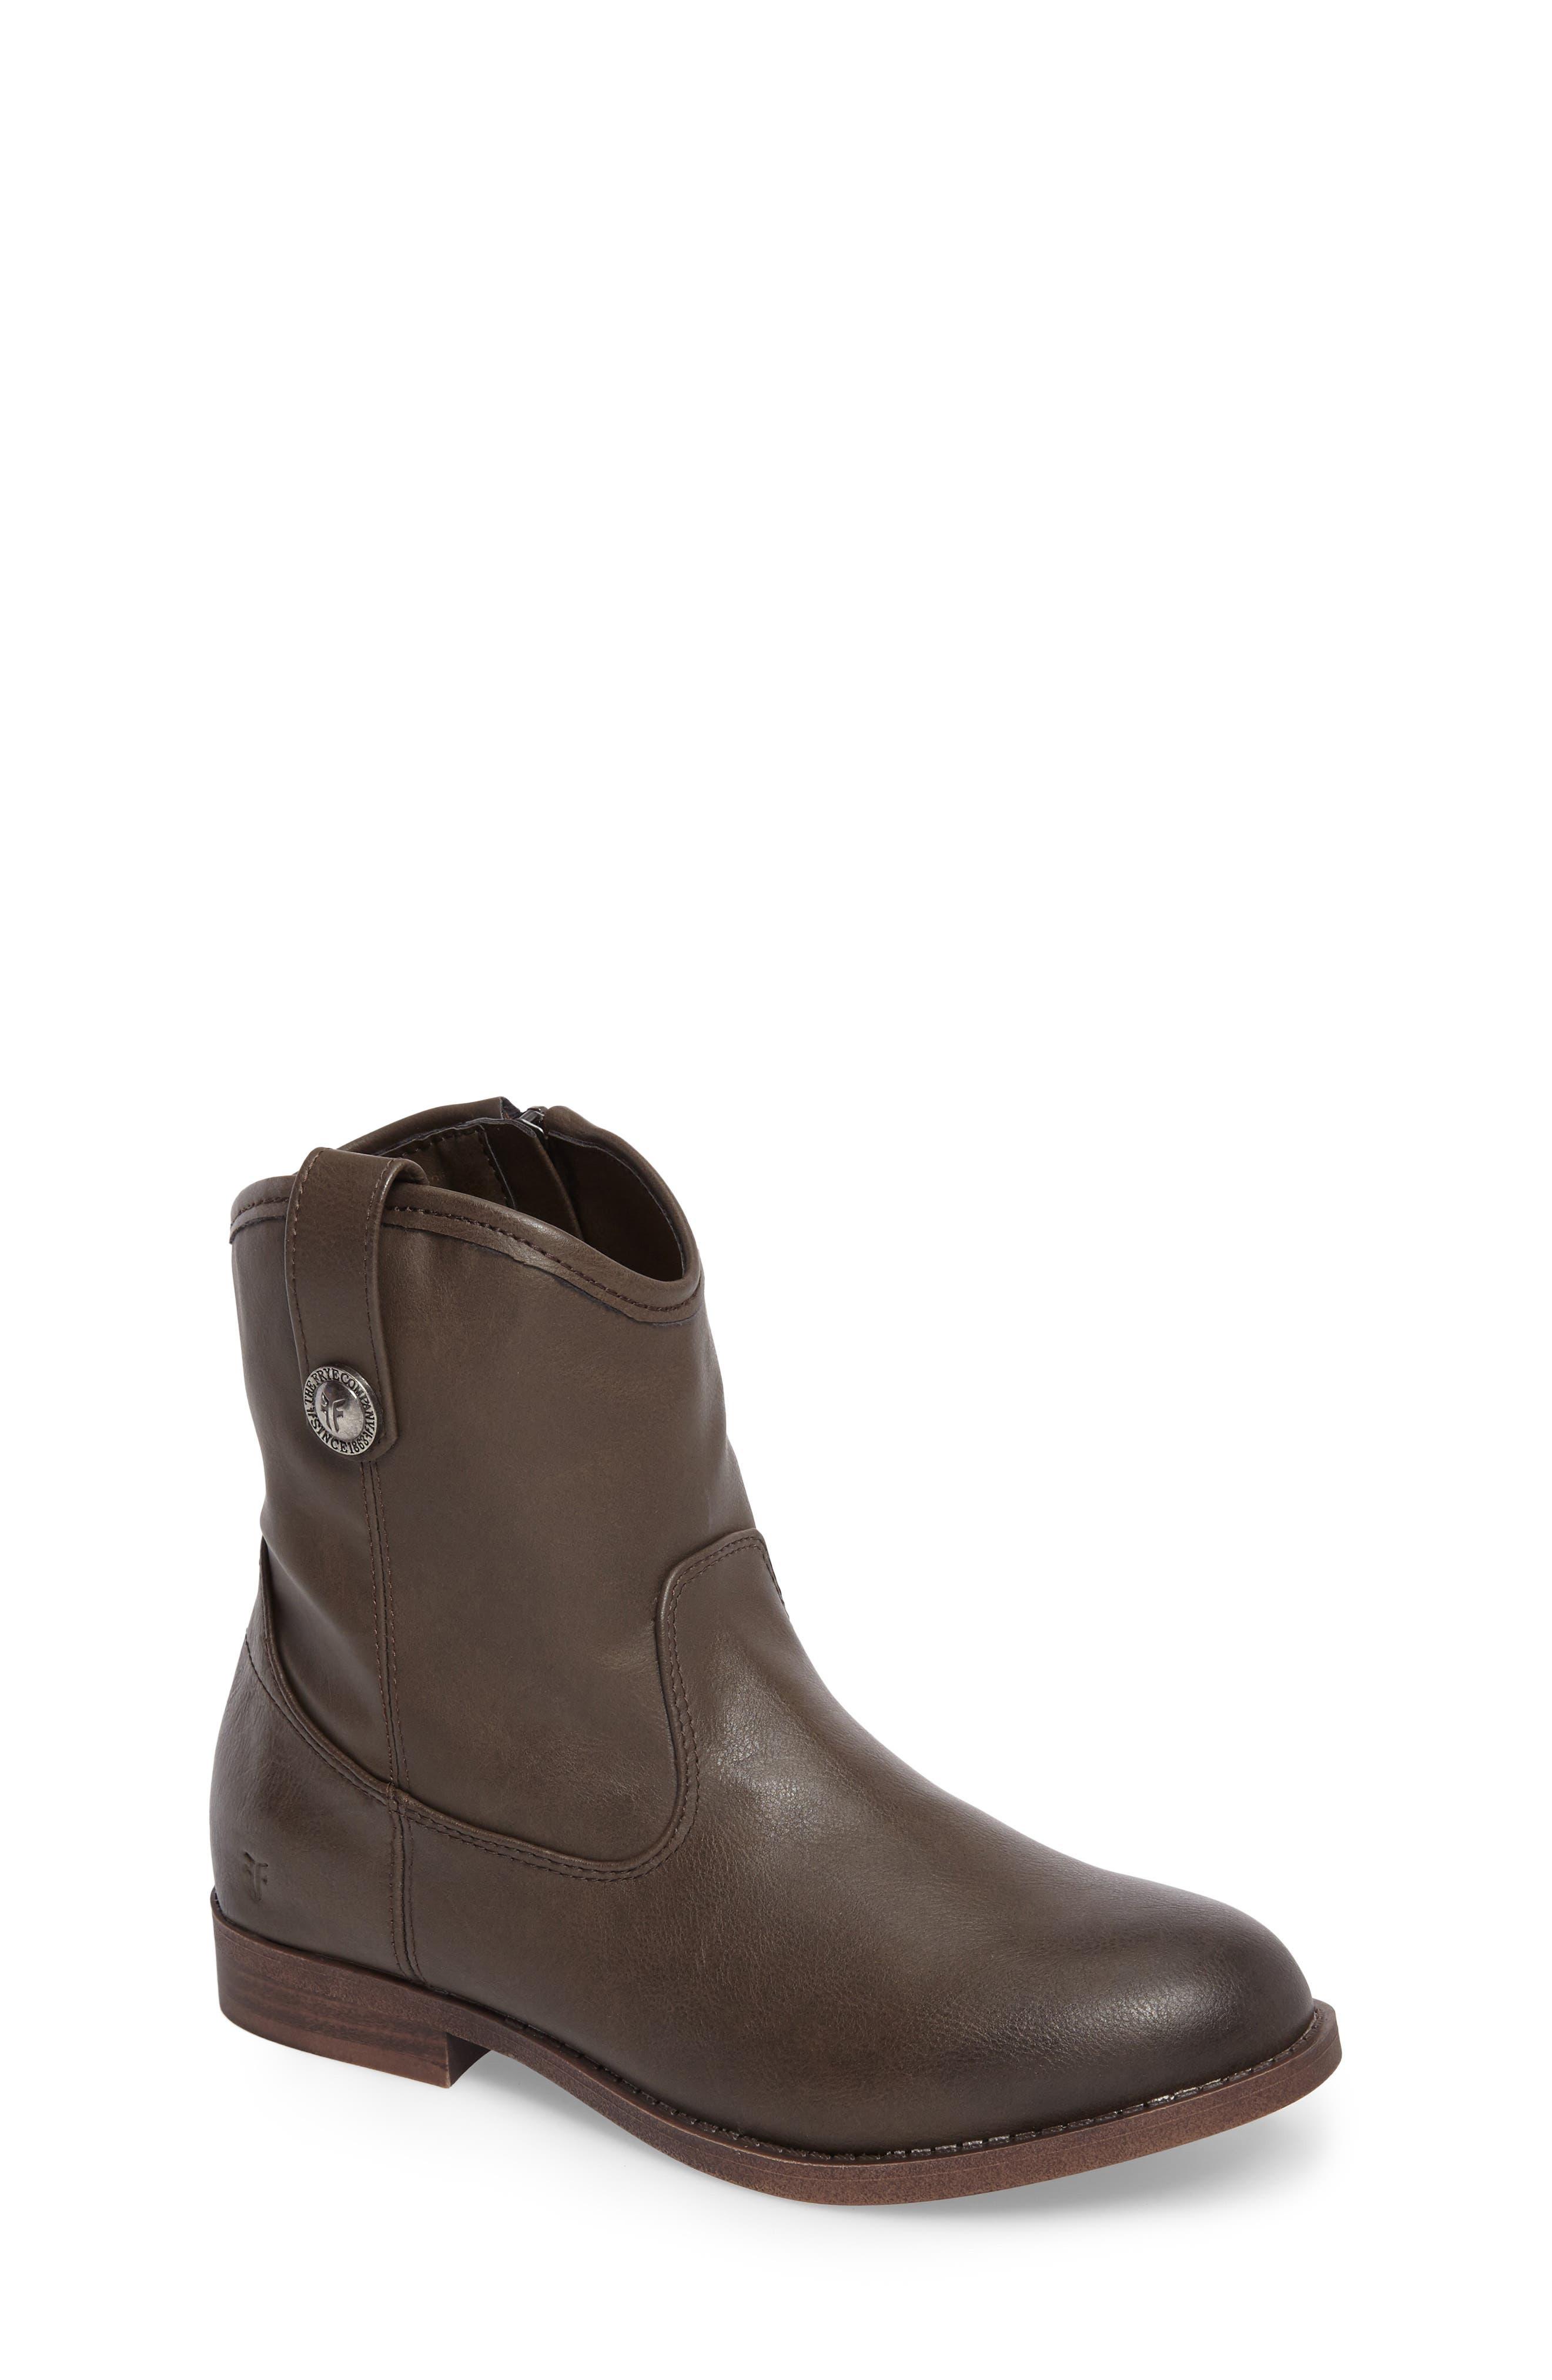 Girls Frye Melissa Button Boot Size 5 M  Grey